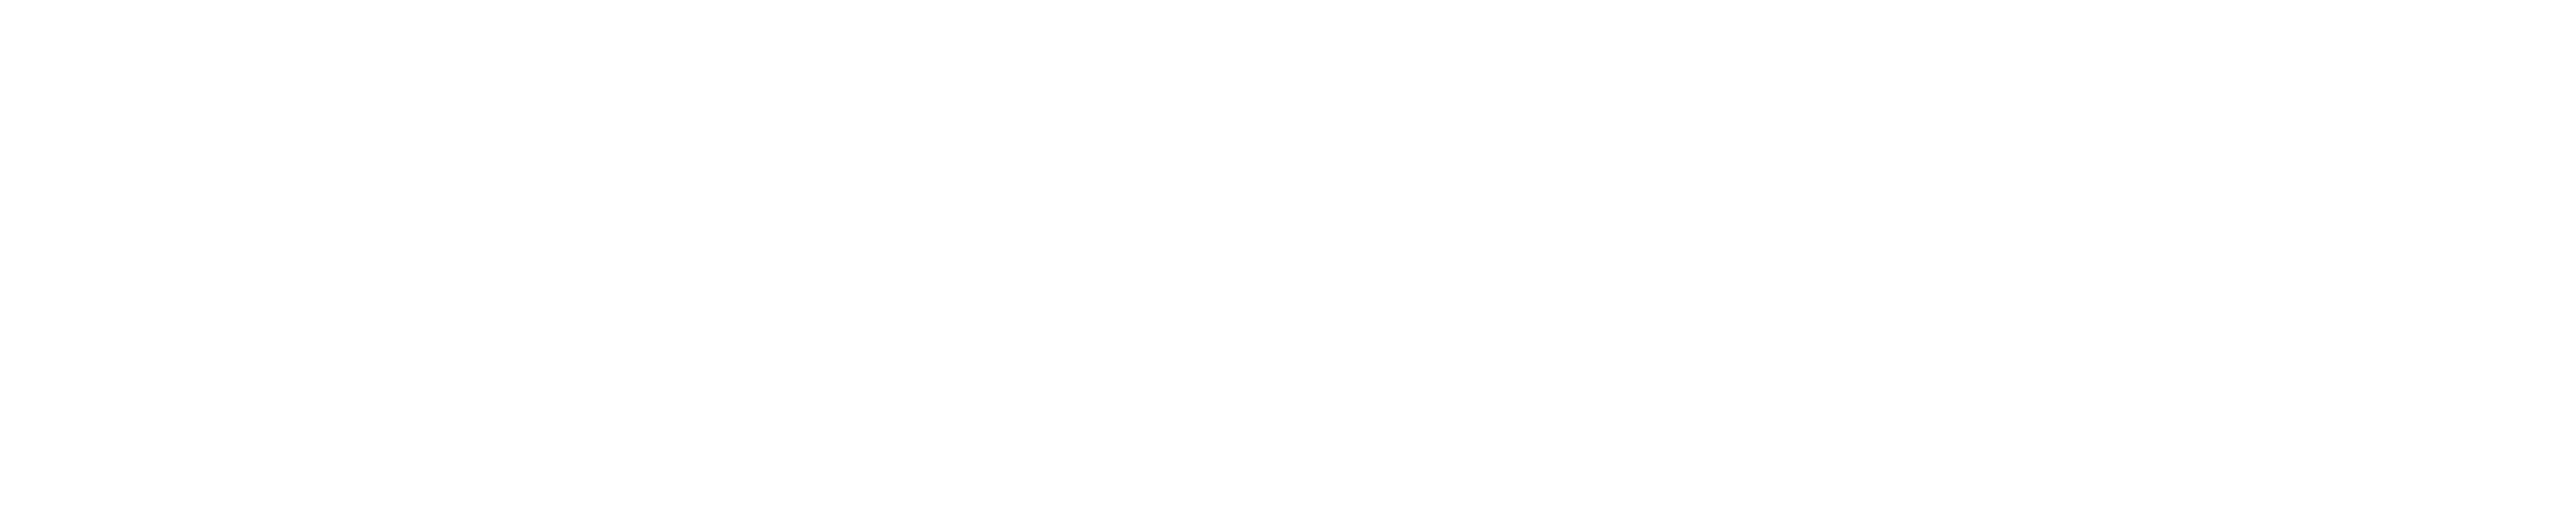 DataStealth Logo 2018 WHITE-1.png